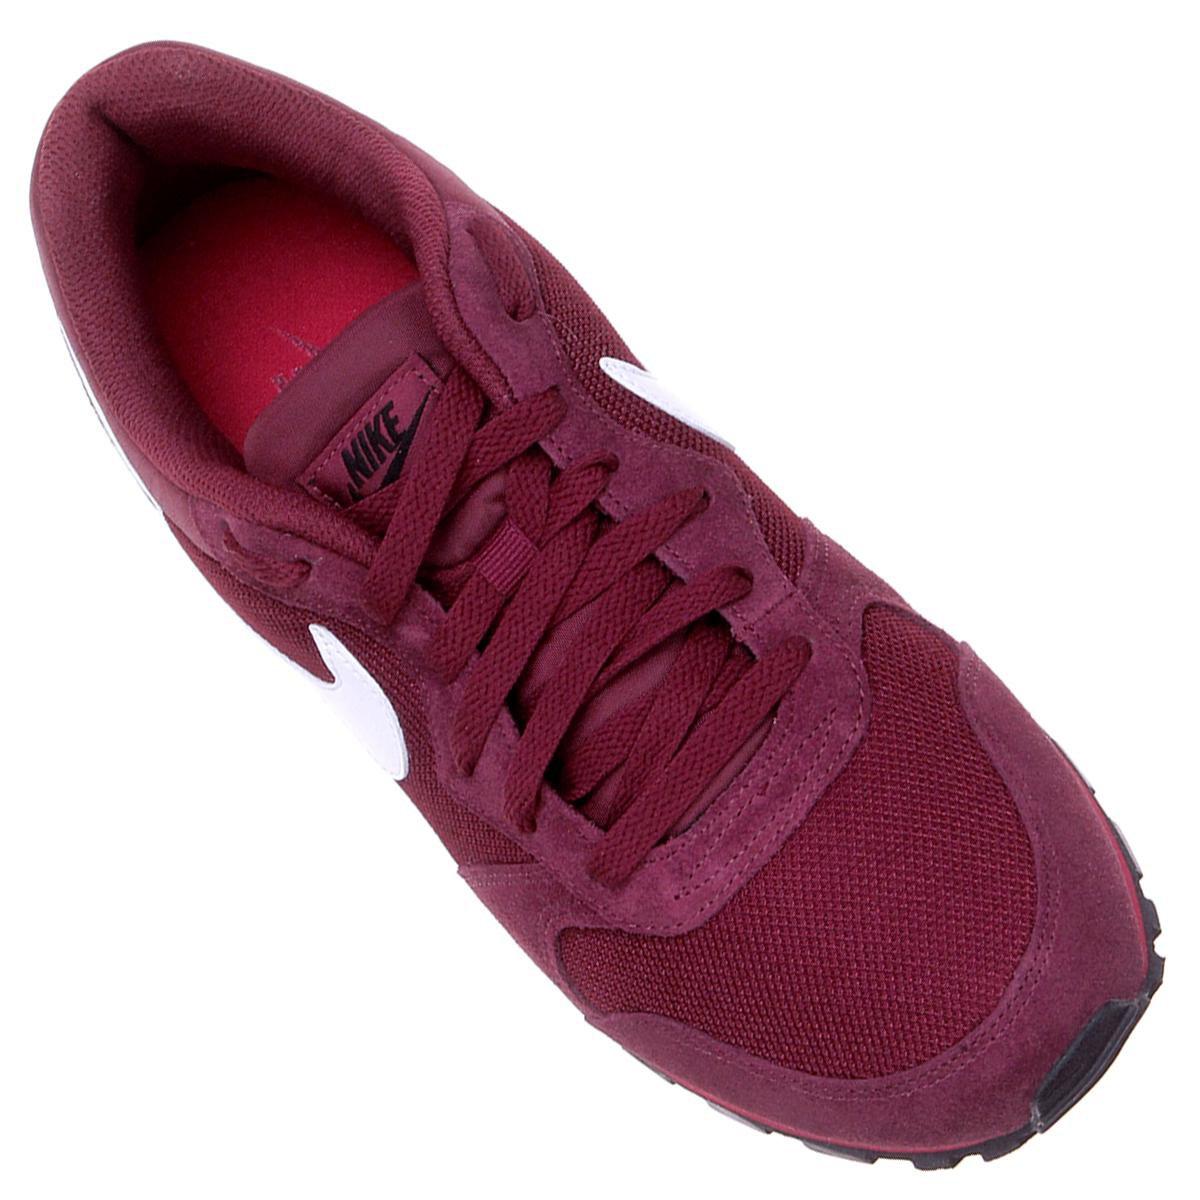 Tênis Nike Md Runner 2 Masculino - Vermelho Escuro e Branco - Compre ... 406fab5ad0b90